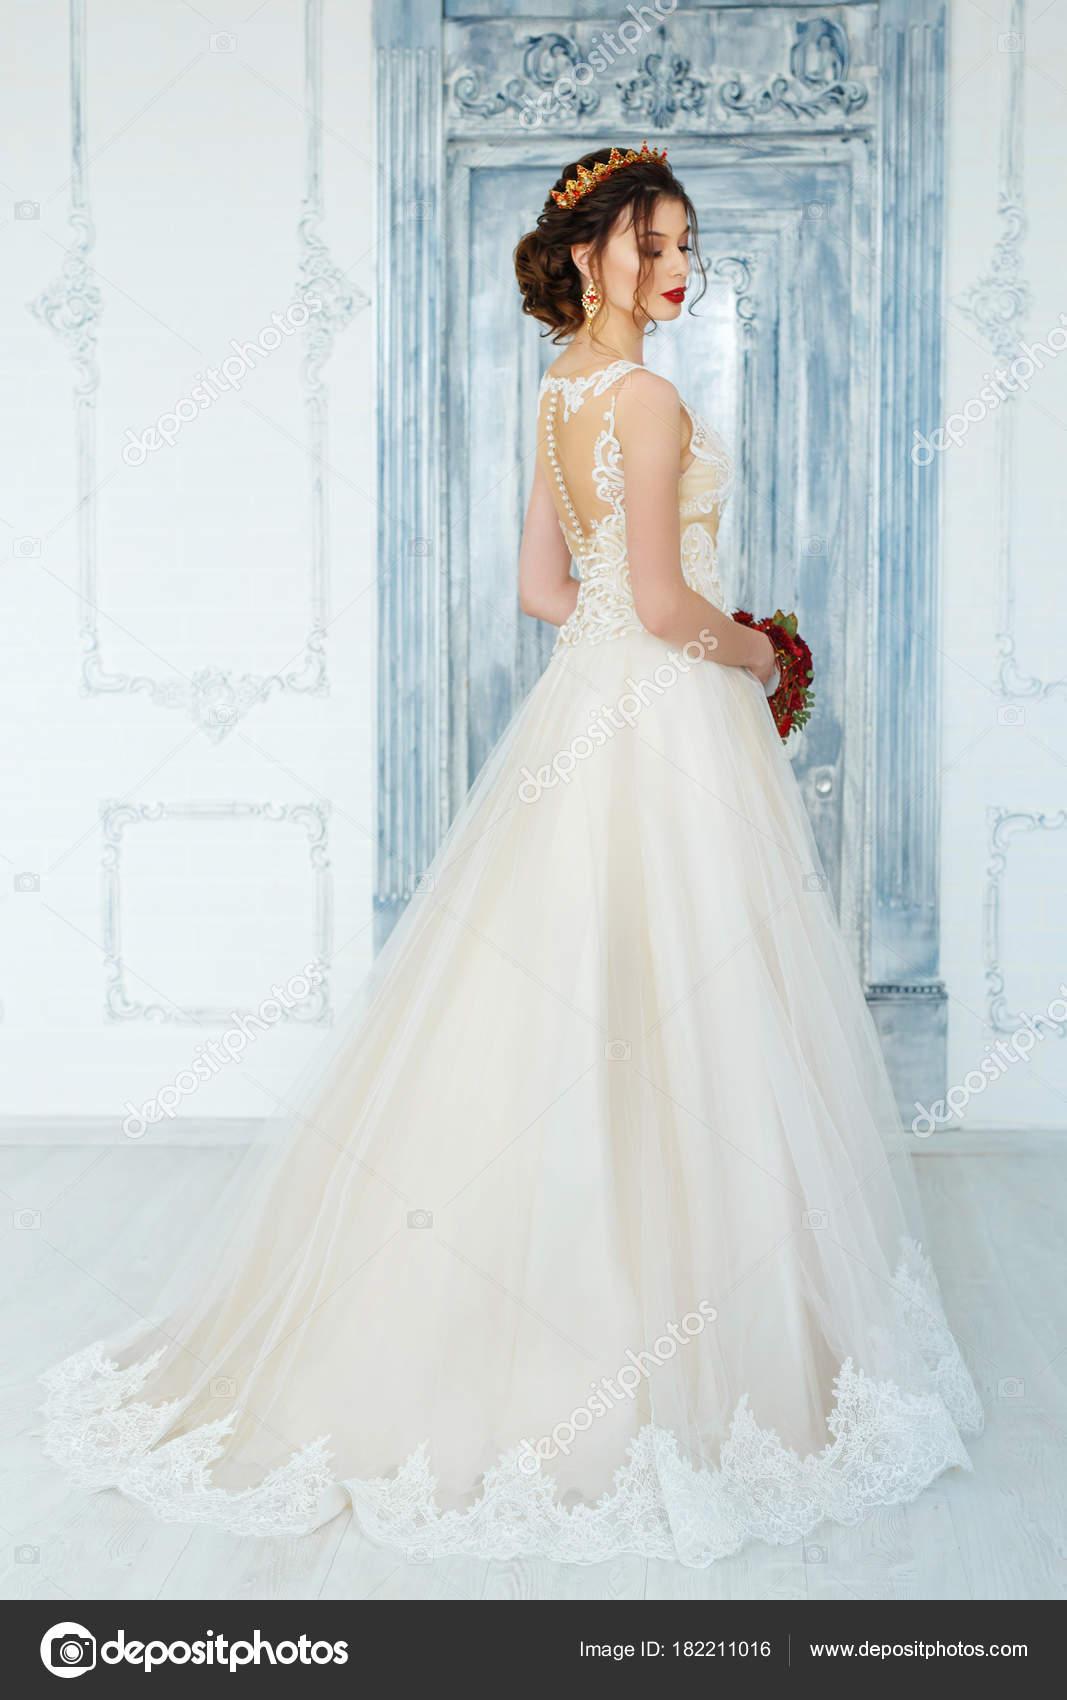 Vestidos boda mujer joven